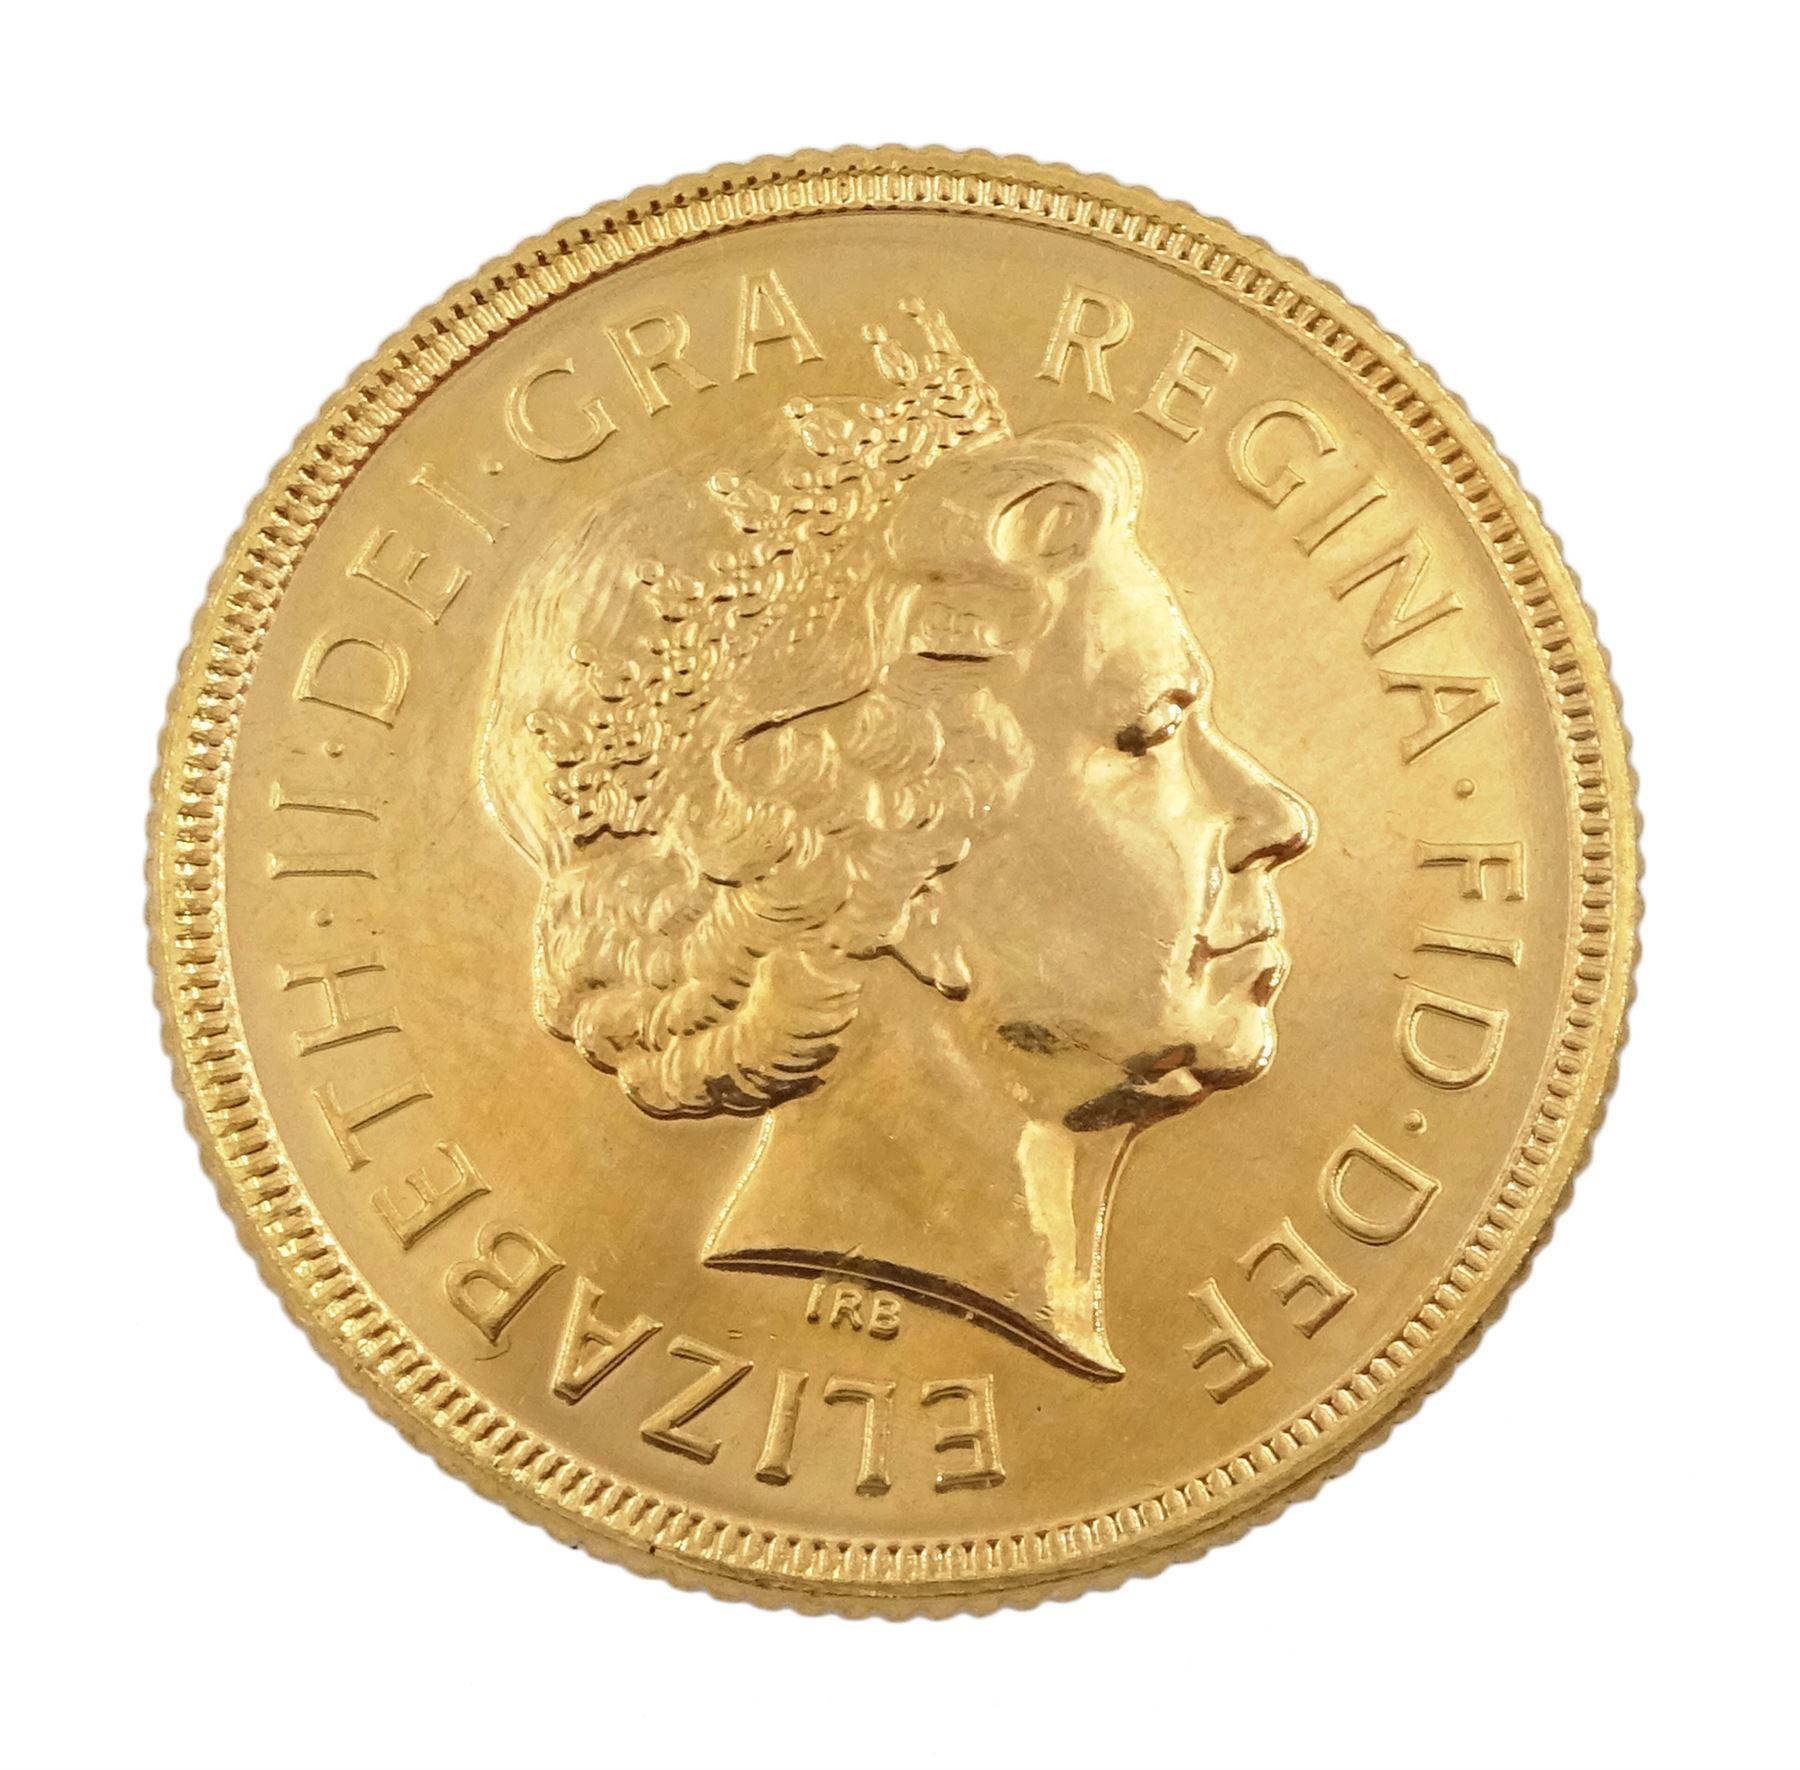 Queen Elizabeth II 2000 gold full sovereign coin - Image 2 of 3